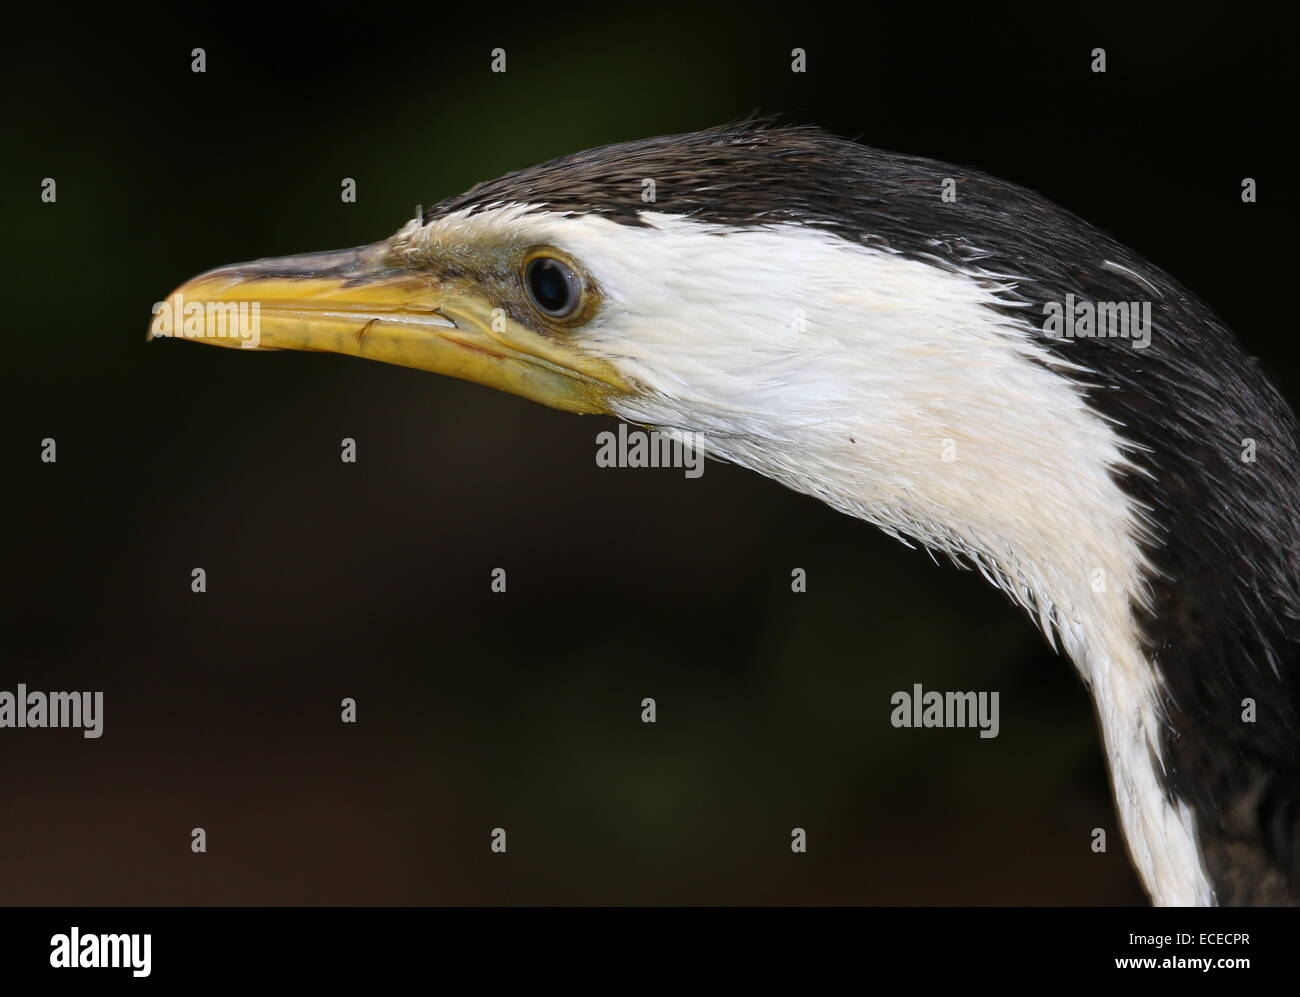 mature  Australian Little pied cormorant (Phalacrocorax melanoleucos, Microcarbo melanoleucos) close-up of the head - Stock Image